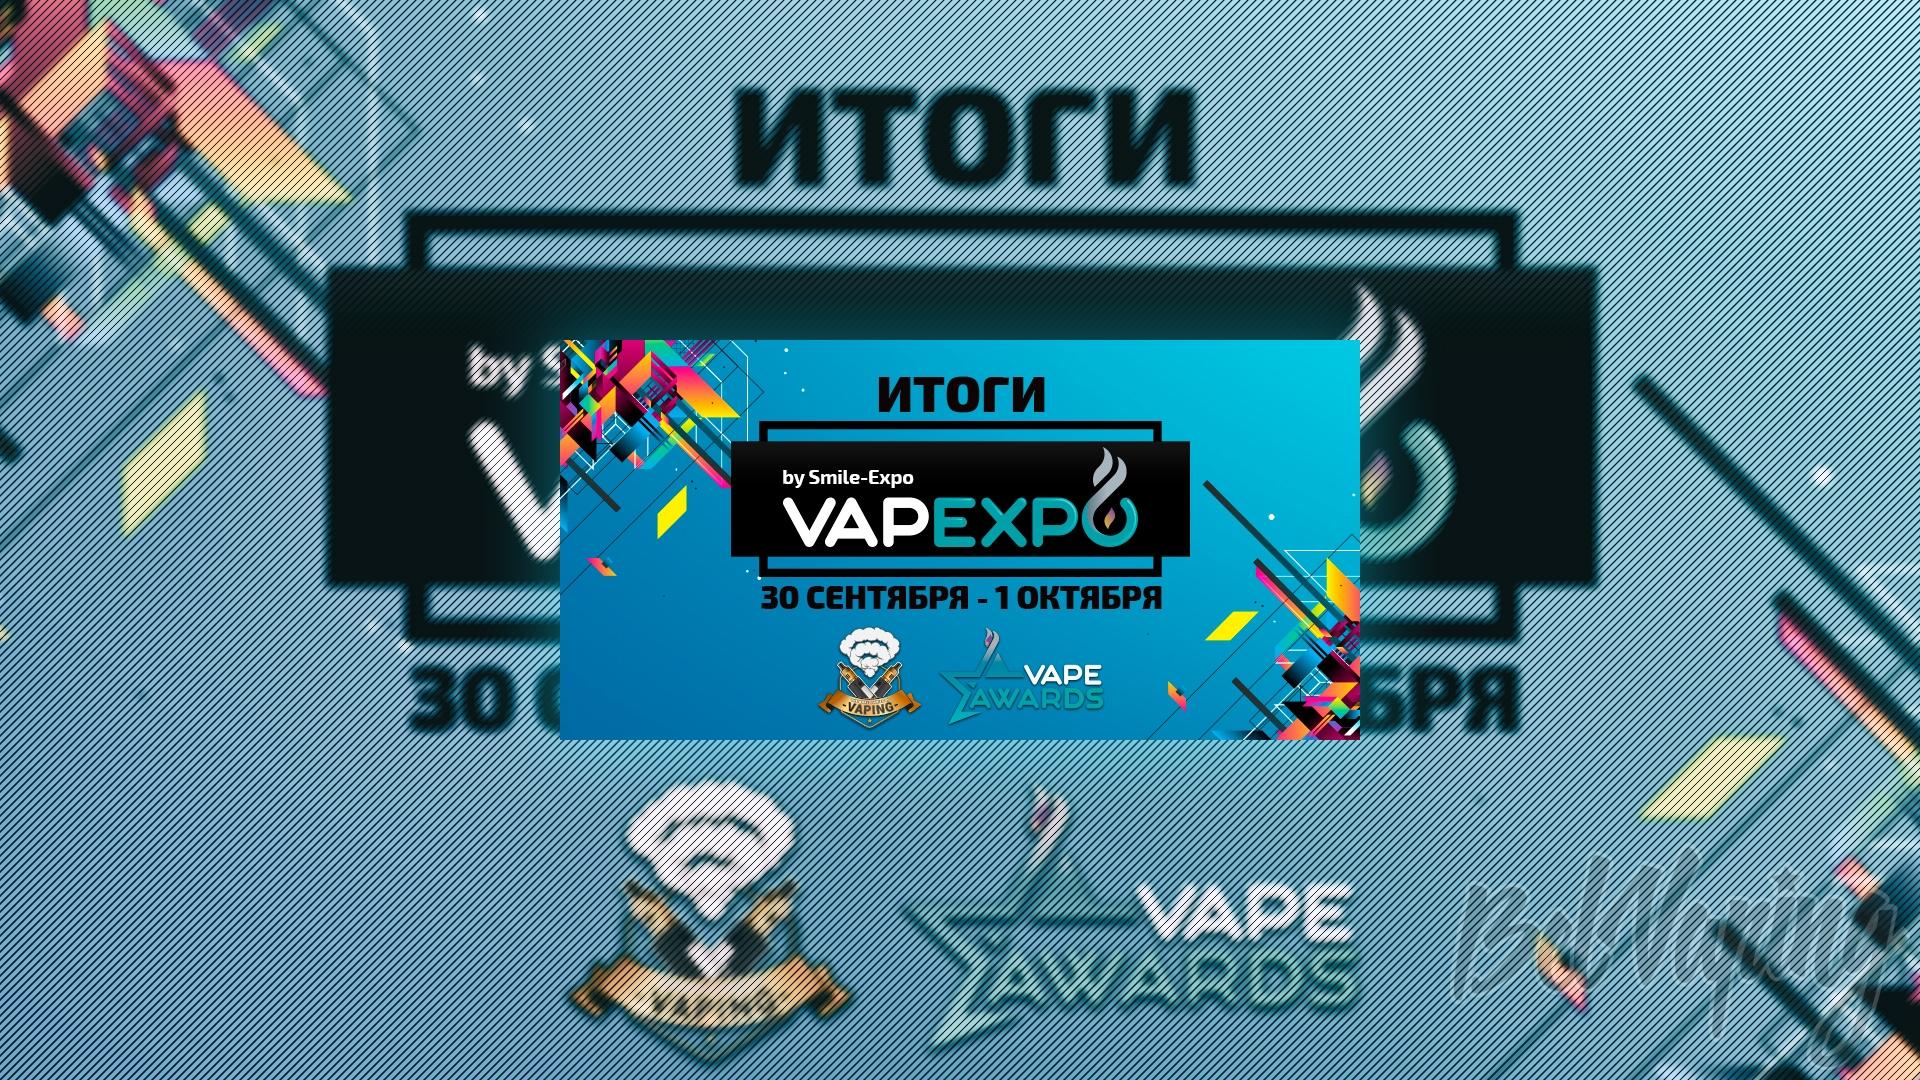 Итоги VAPEXPO Kiev 2017